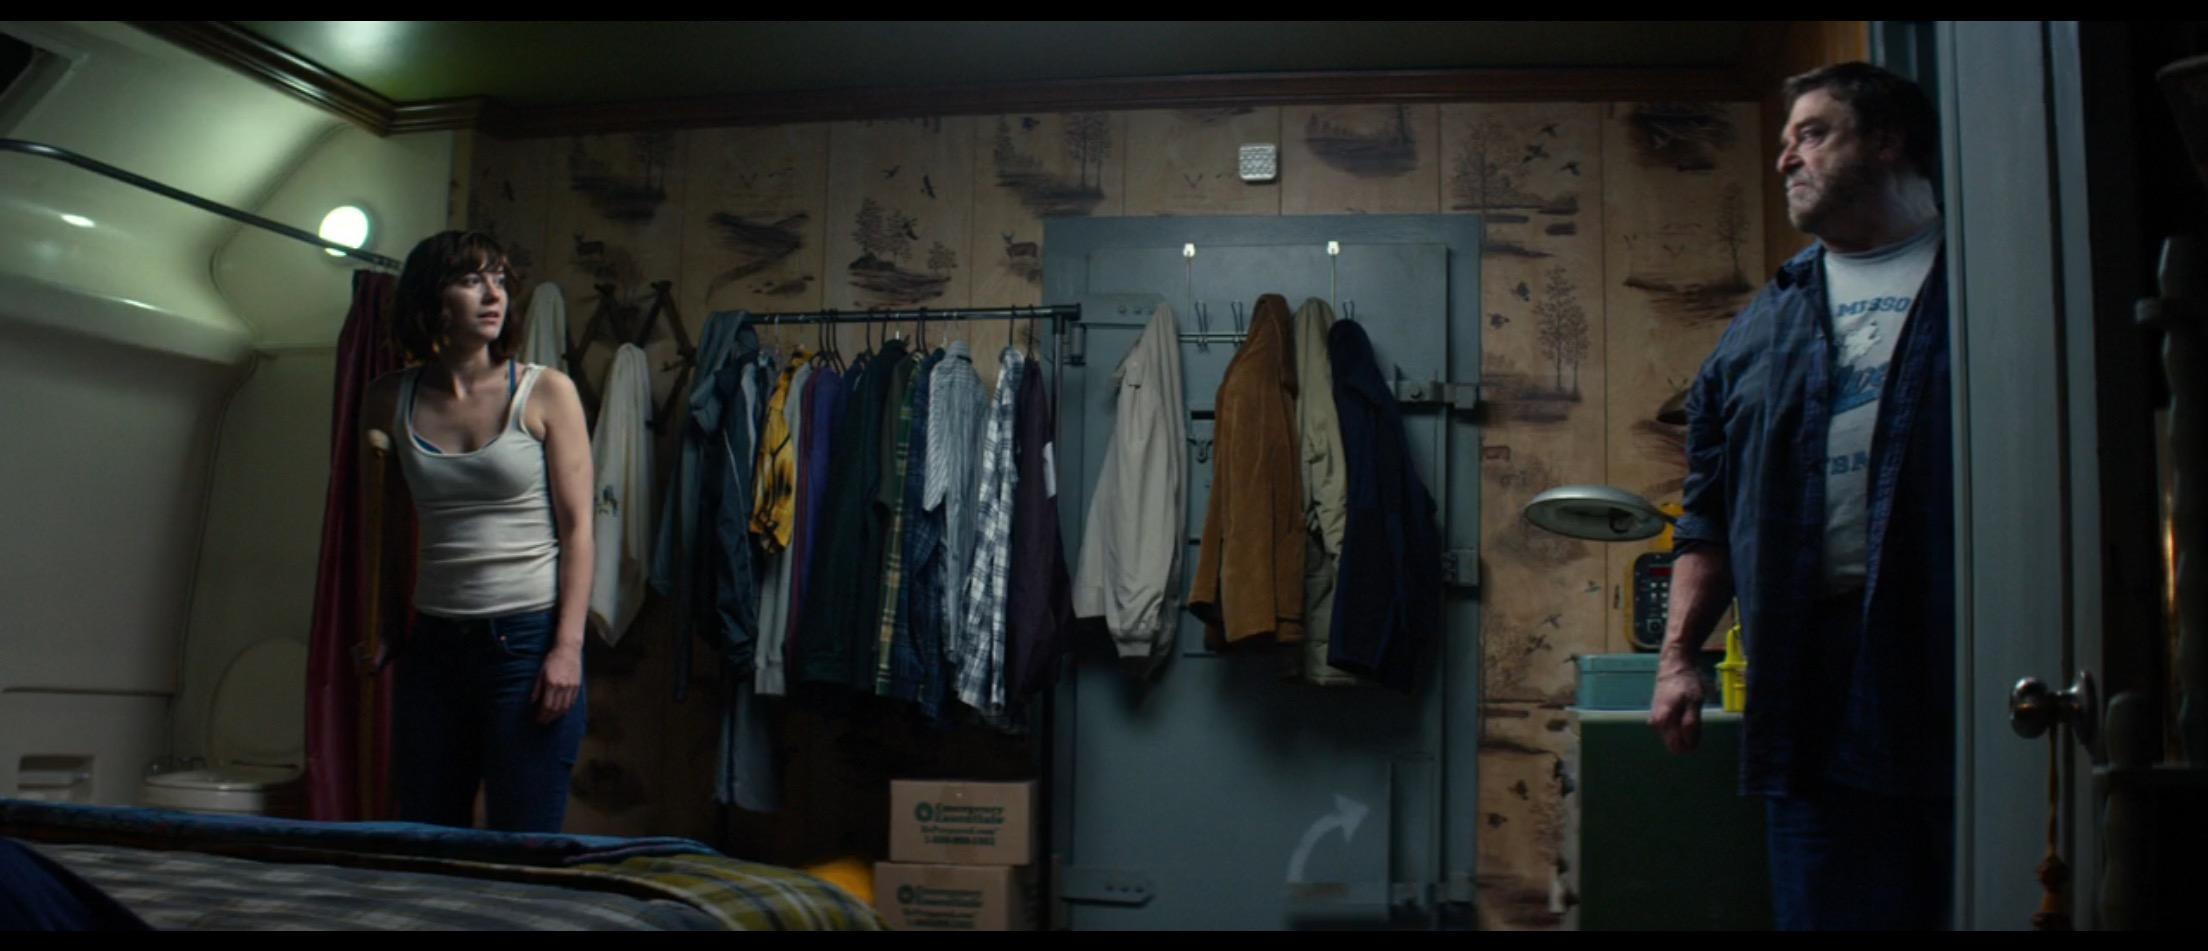 John Goodman is creepy in a bunker in '10 Cloverfield Lane.' (Screenshot courtesy of Paramount)